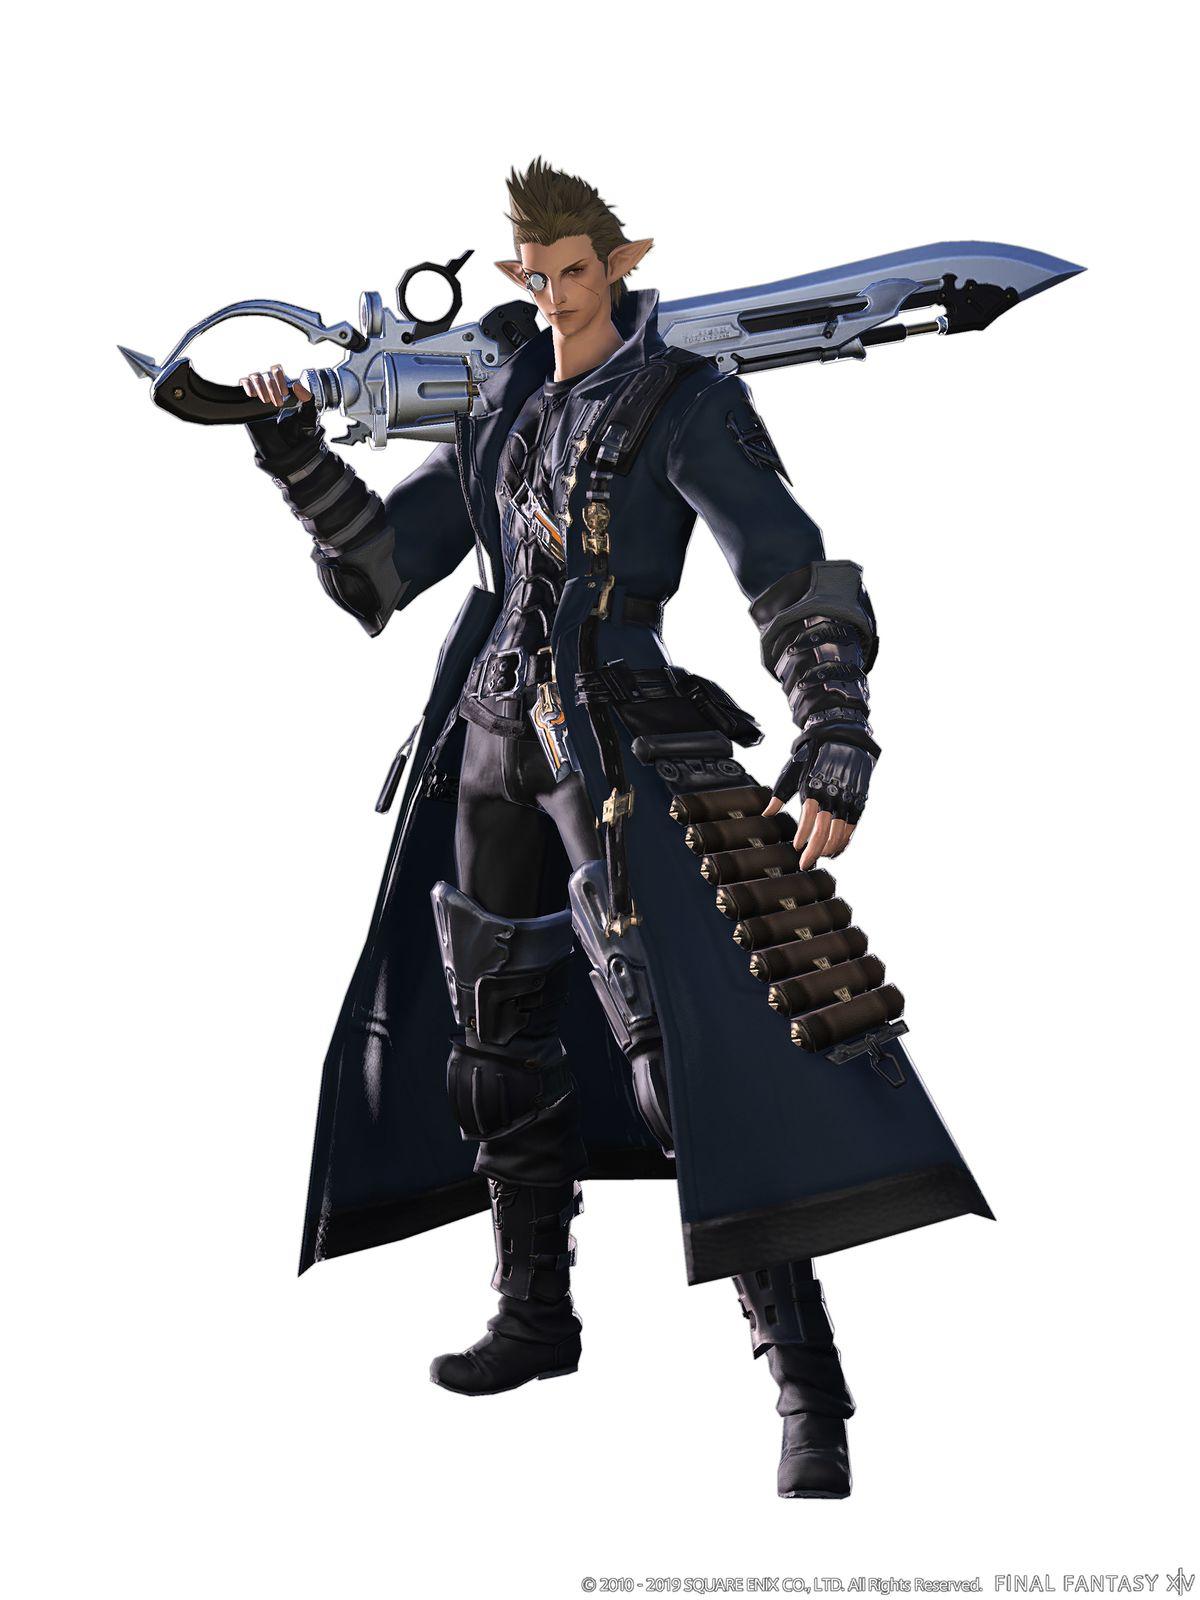 Gunbreaker - Final Fantasy XIV: A Realm Reborn (FFXIV) Wiki